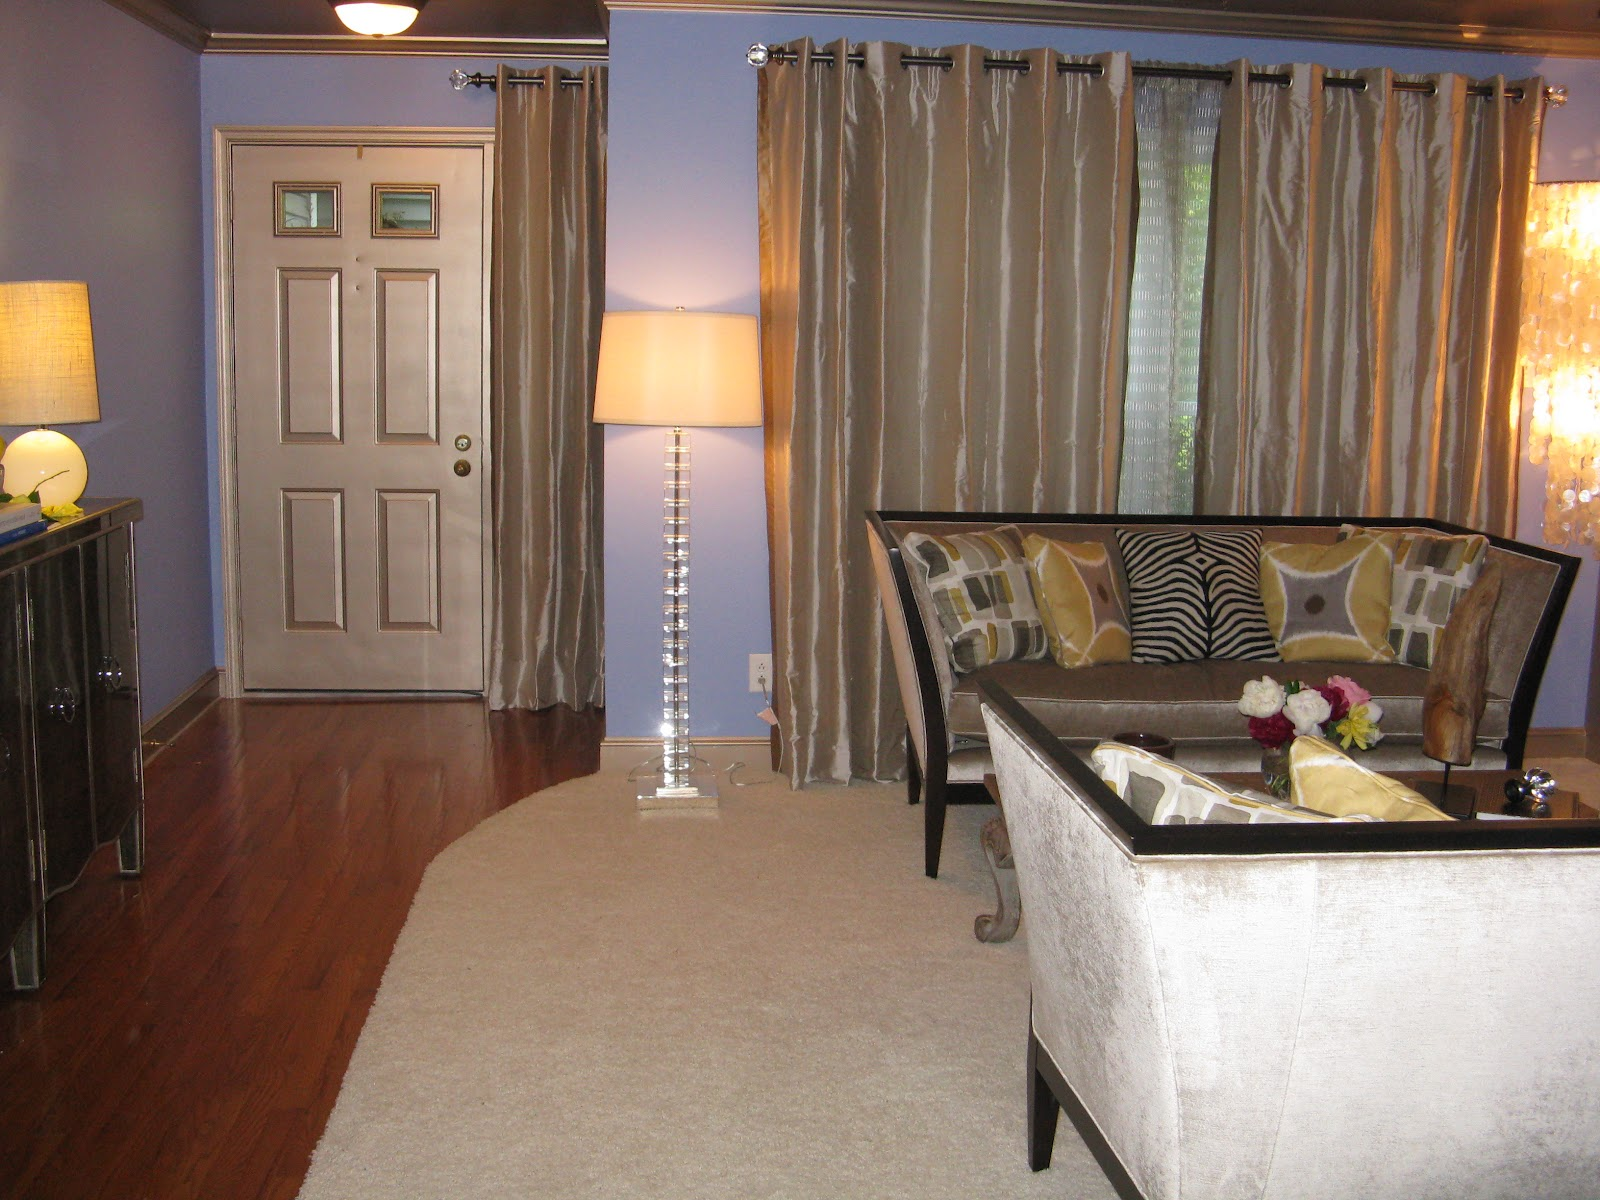 Maddiejhomedecor redecorating dining and living room for Redecorating living room